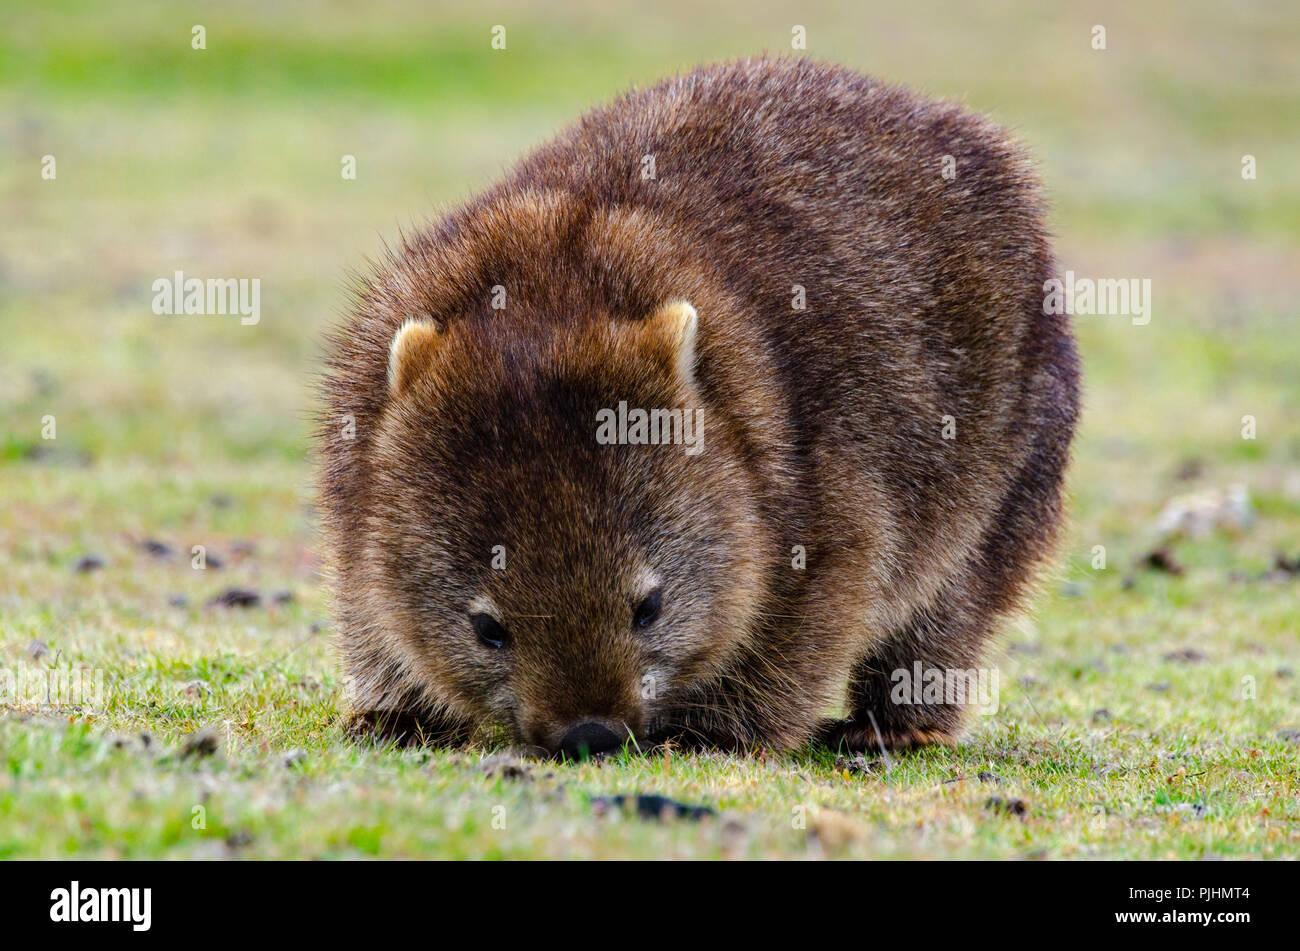 common wombat Vombatus ursinus tasmaniensis, Narawntapu National Park, Tasmania, Australia Stock Photo